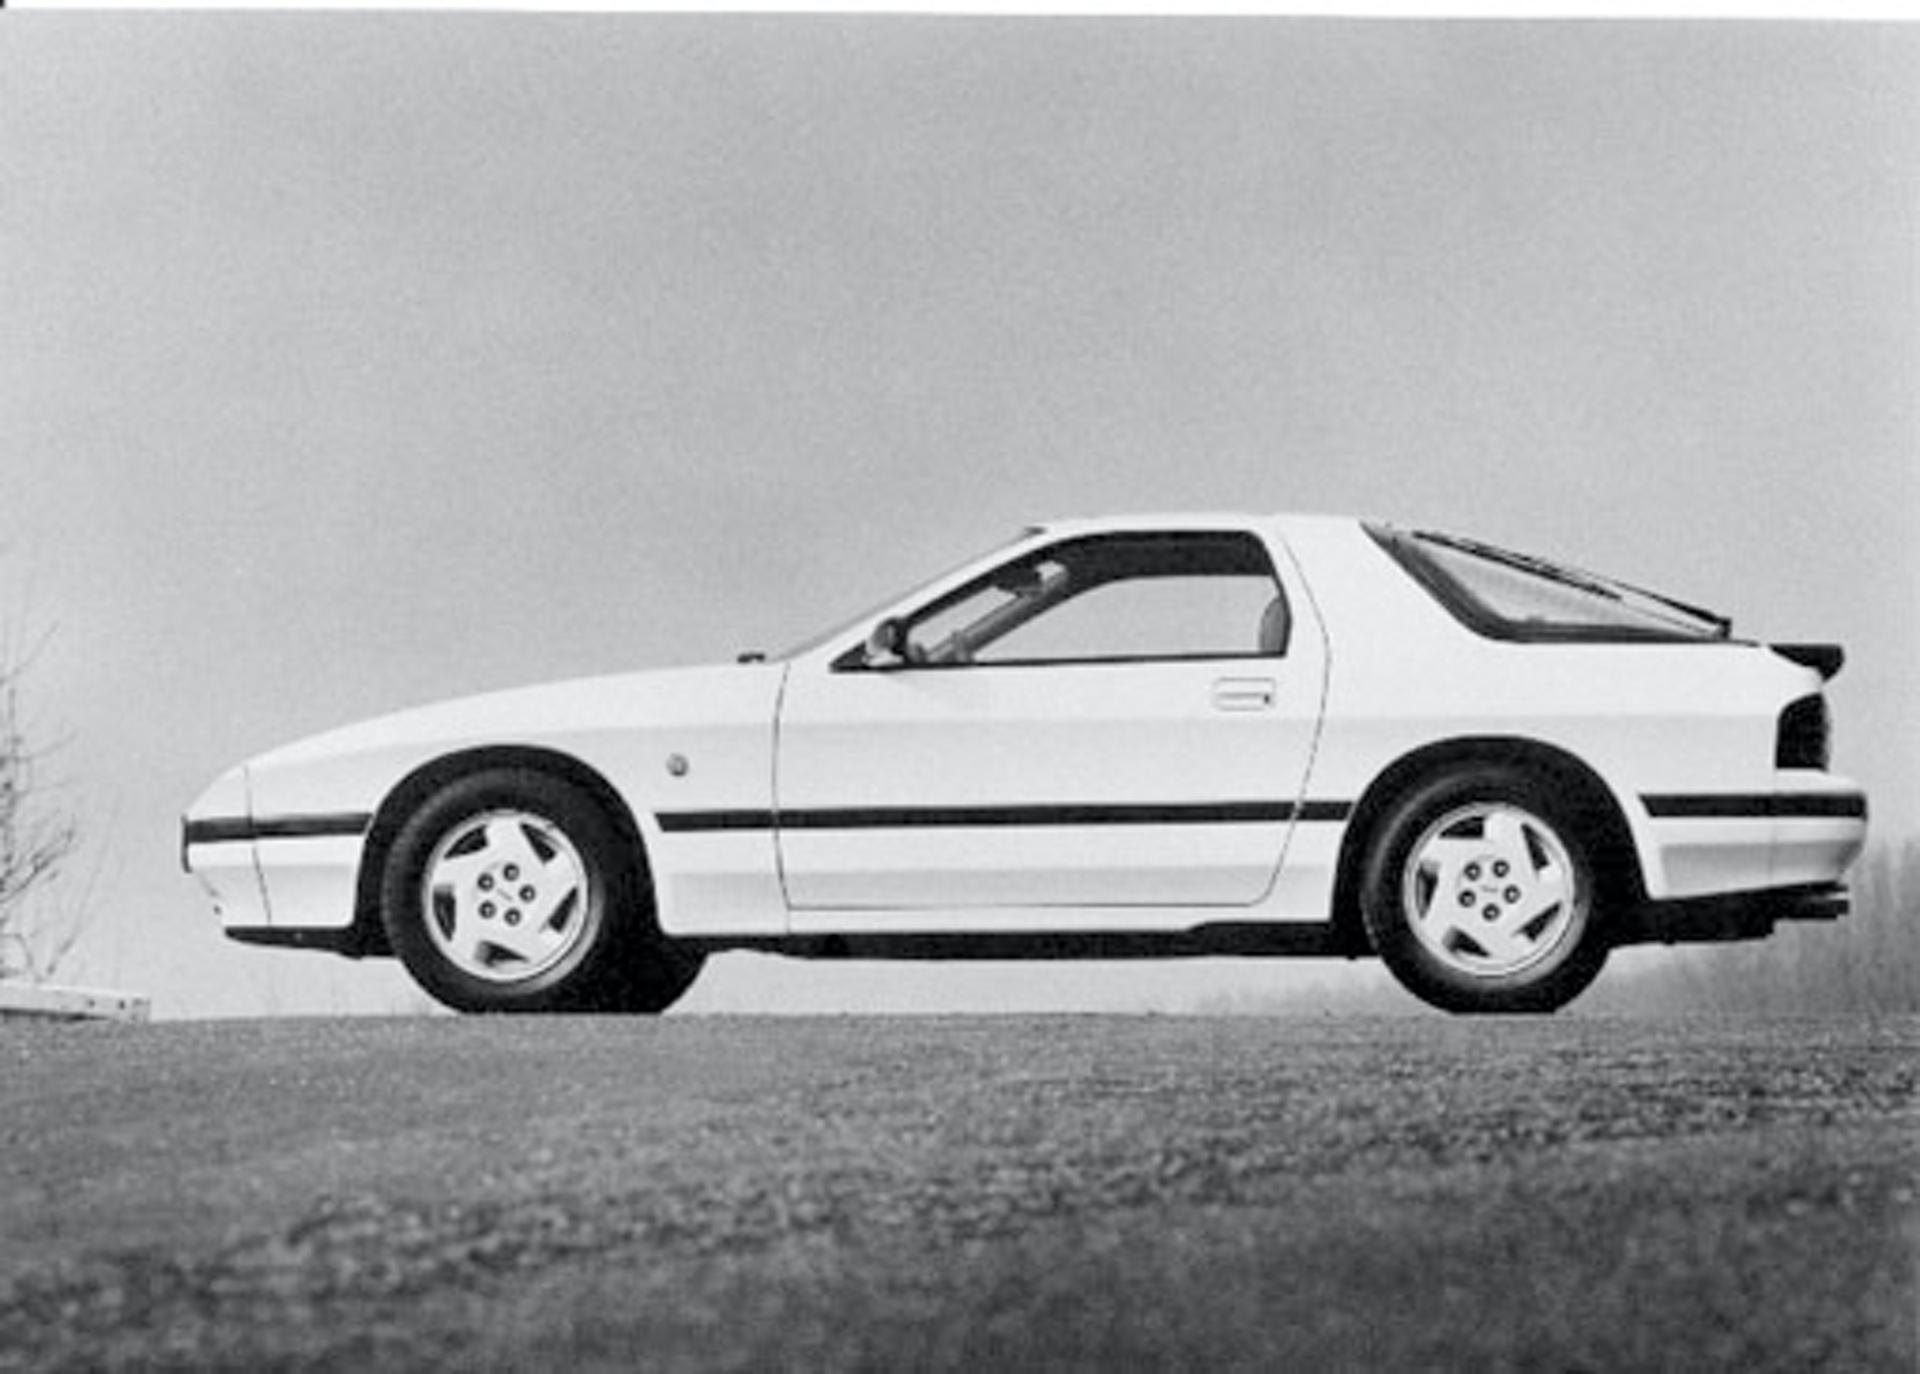 Mazda_RX-7_history_0070